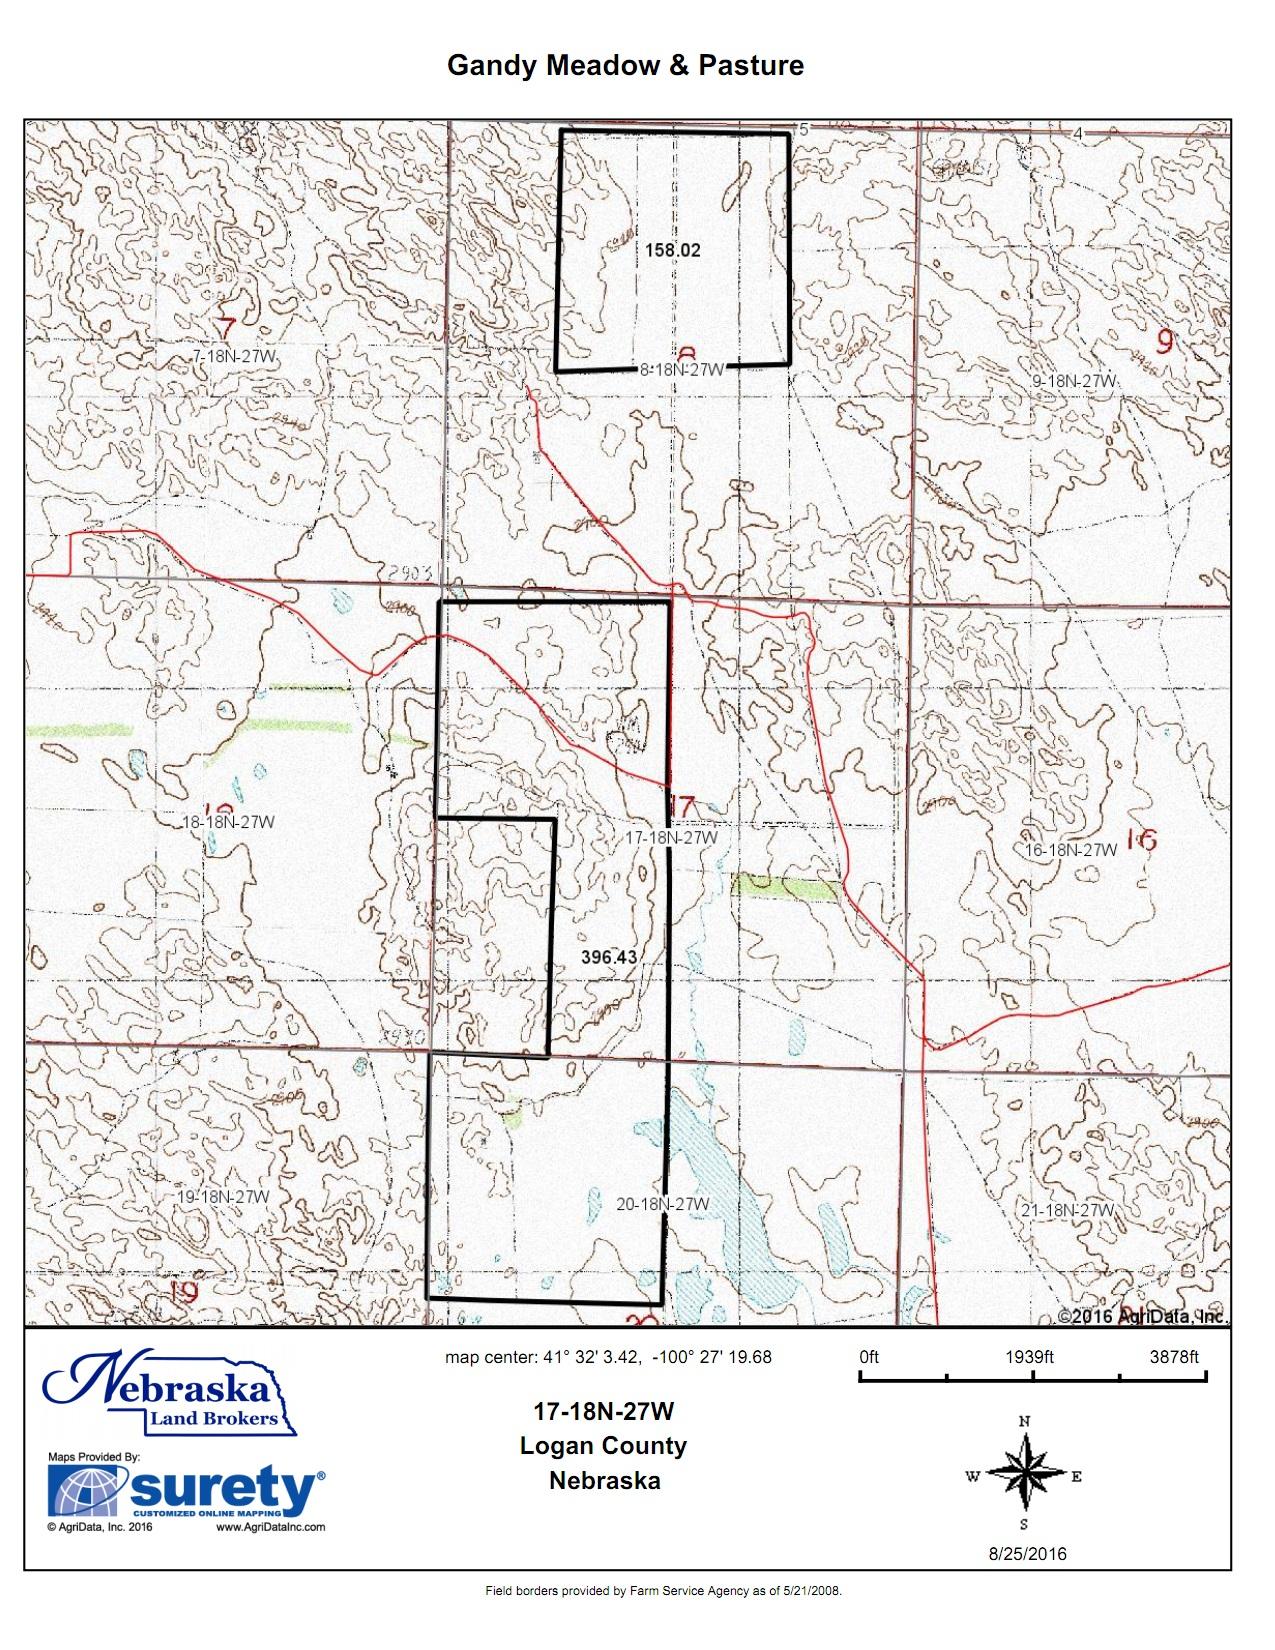 Gandy Meadow Pastures - Surety maps